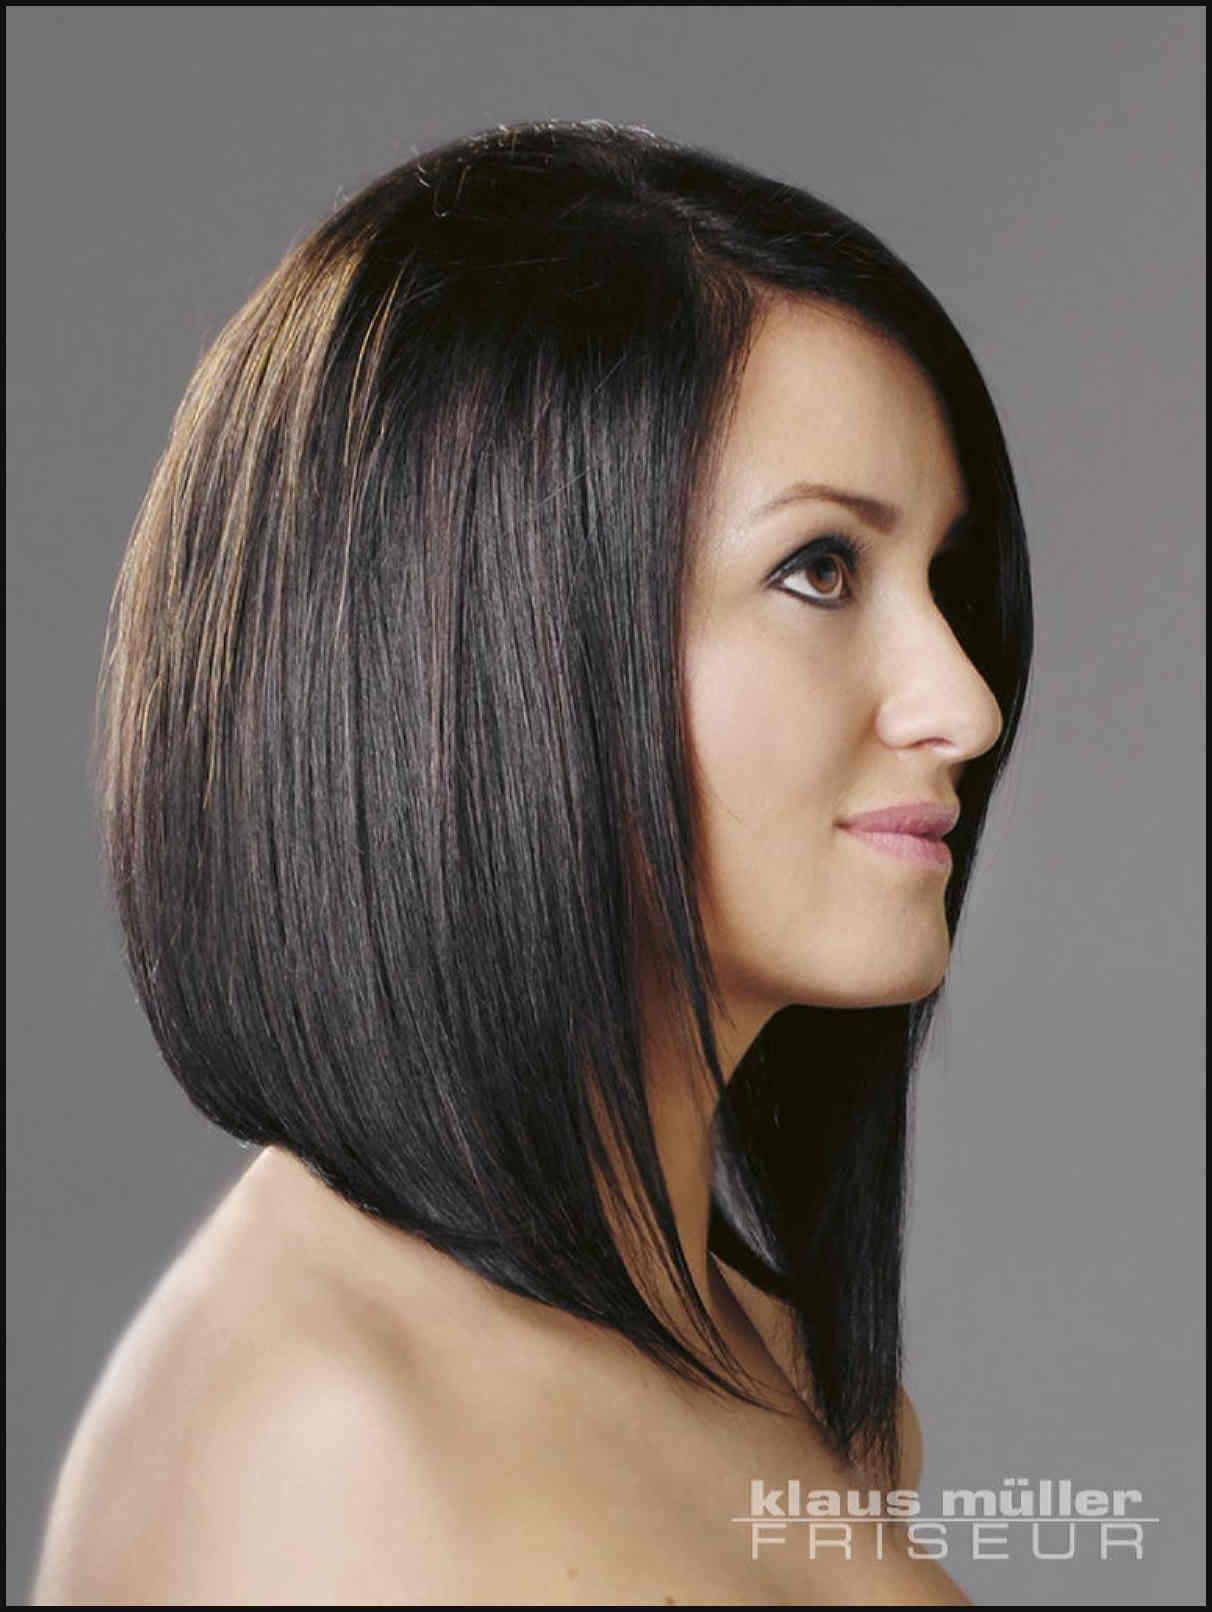 Brillante Frisuren Vorne Lang Hinten Kurz  Bob frisur hinten kurz